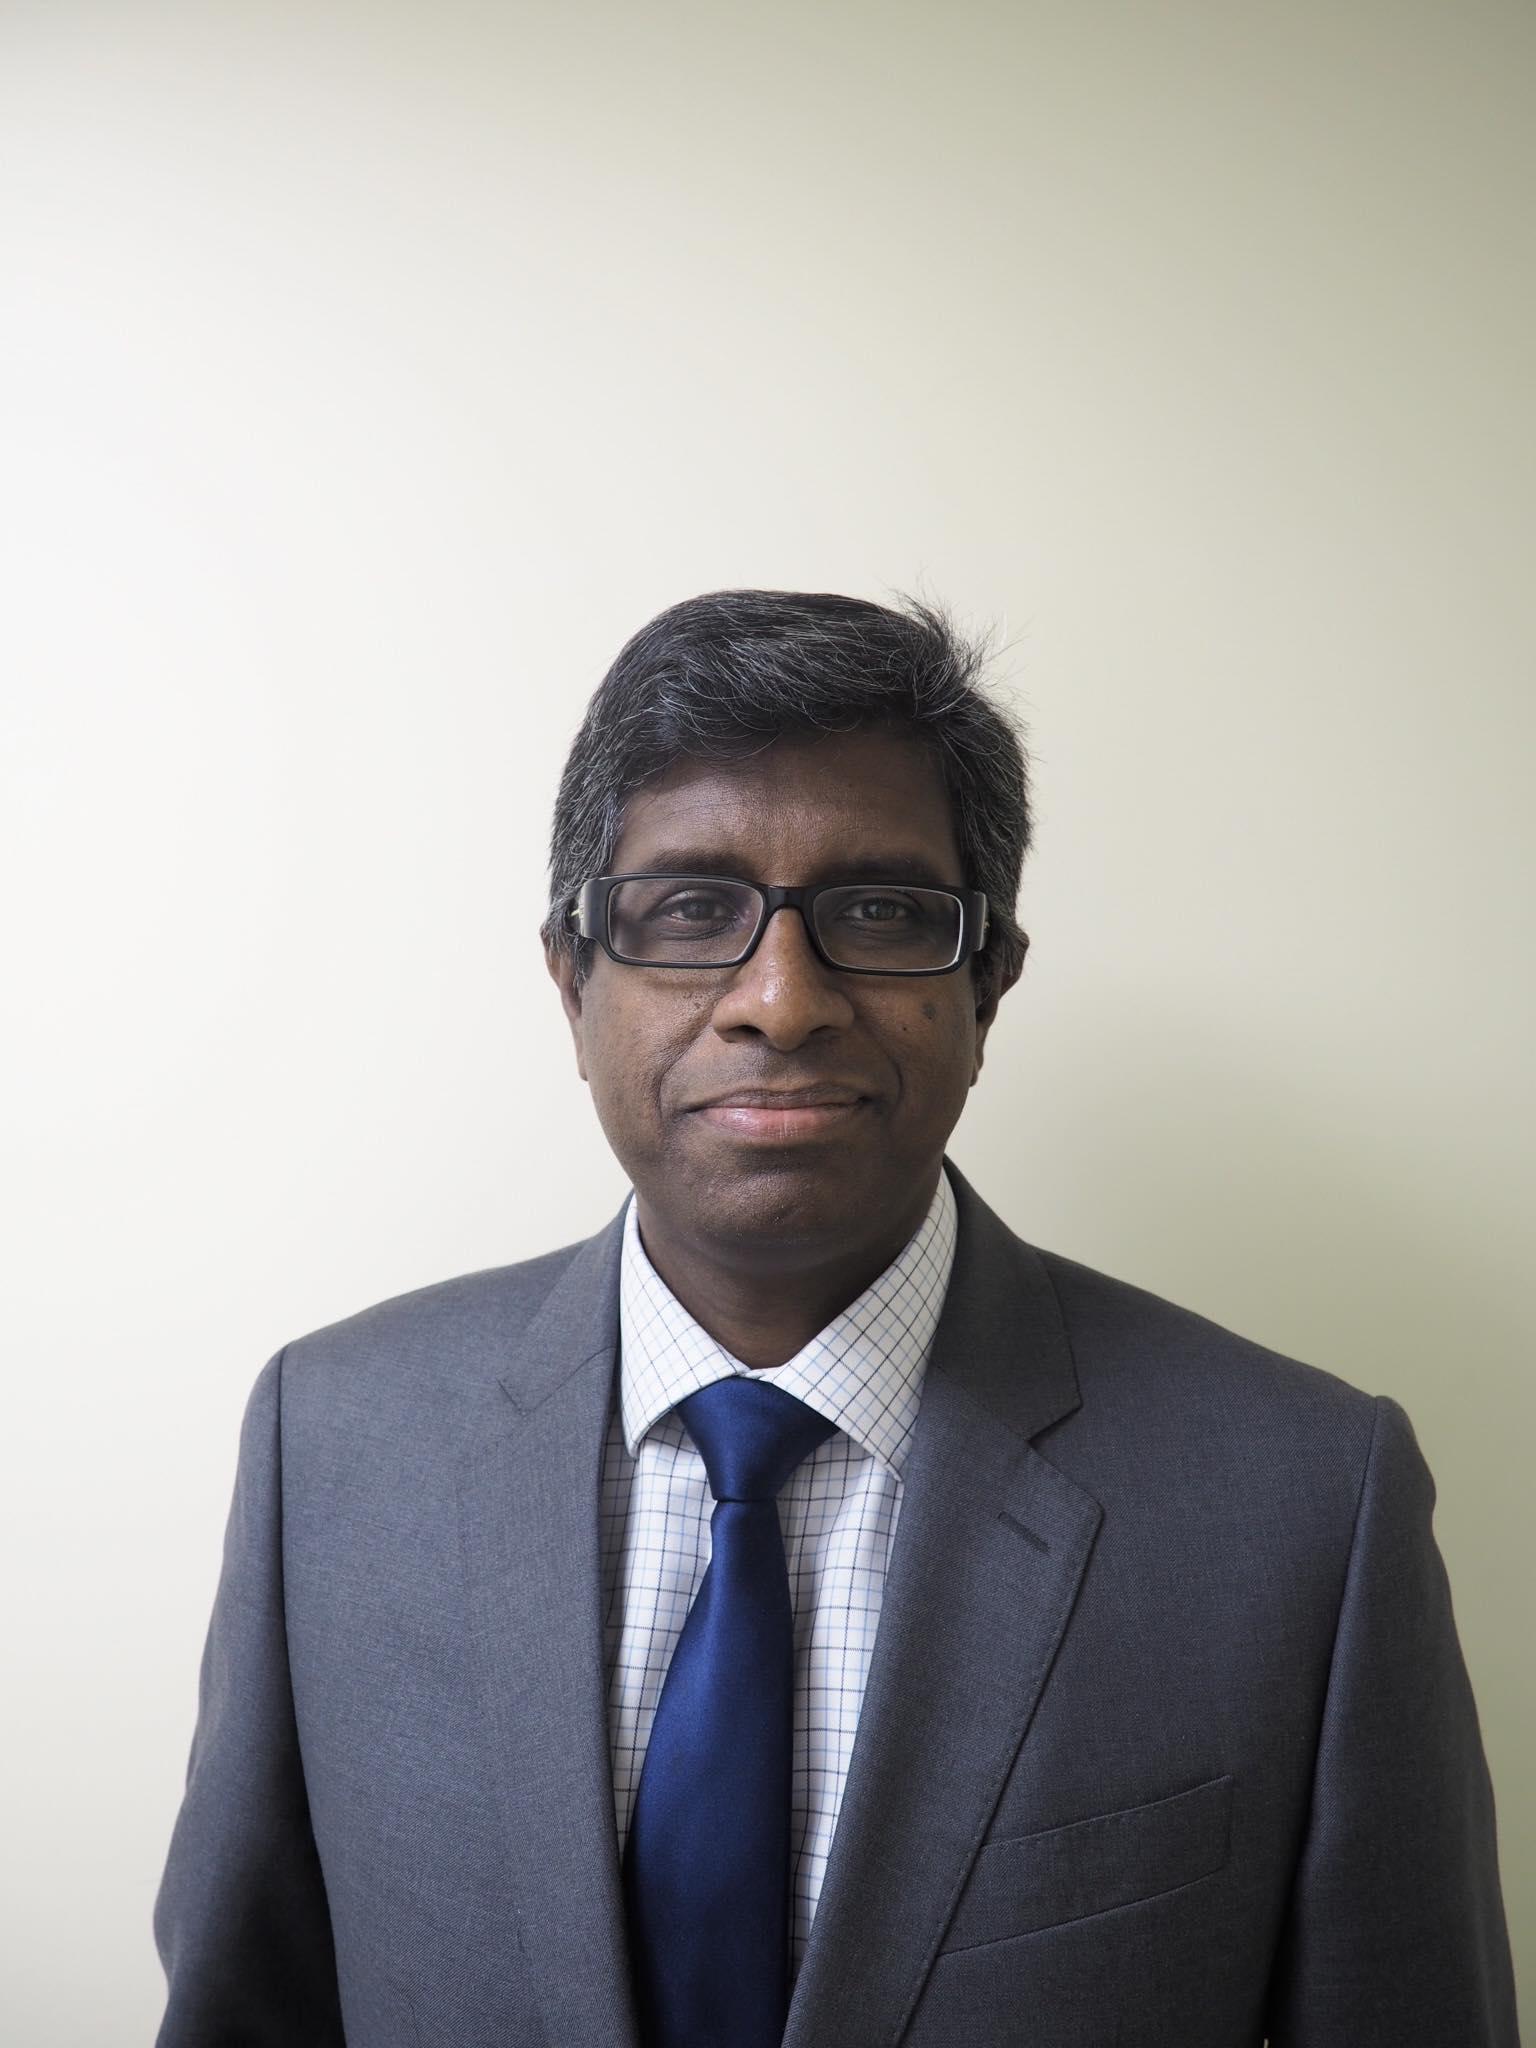 Mr Ashique Aziz Ali